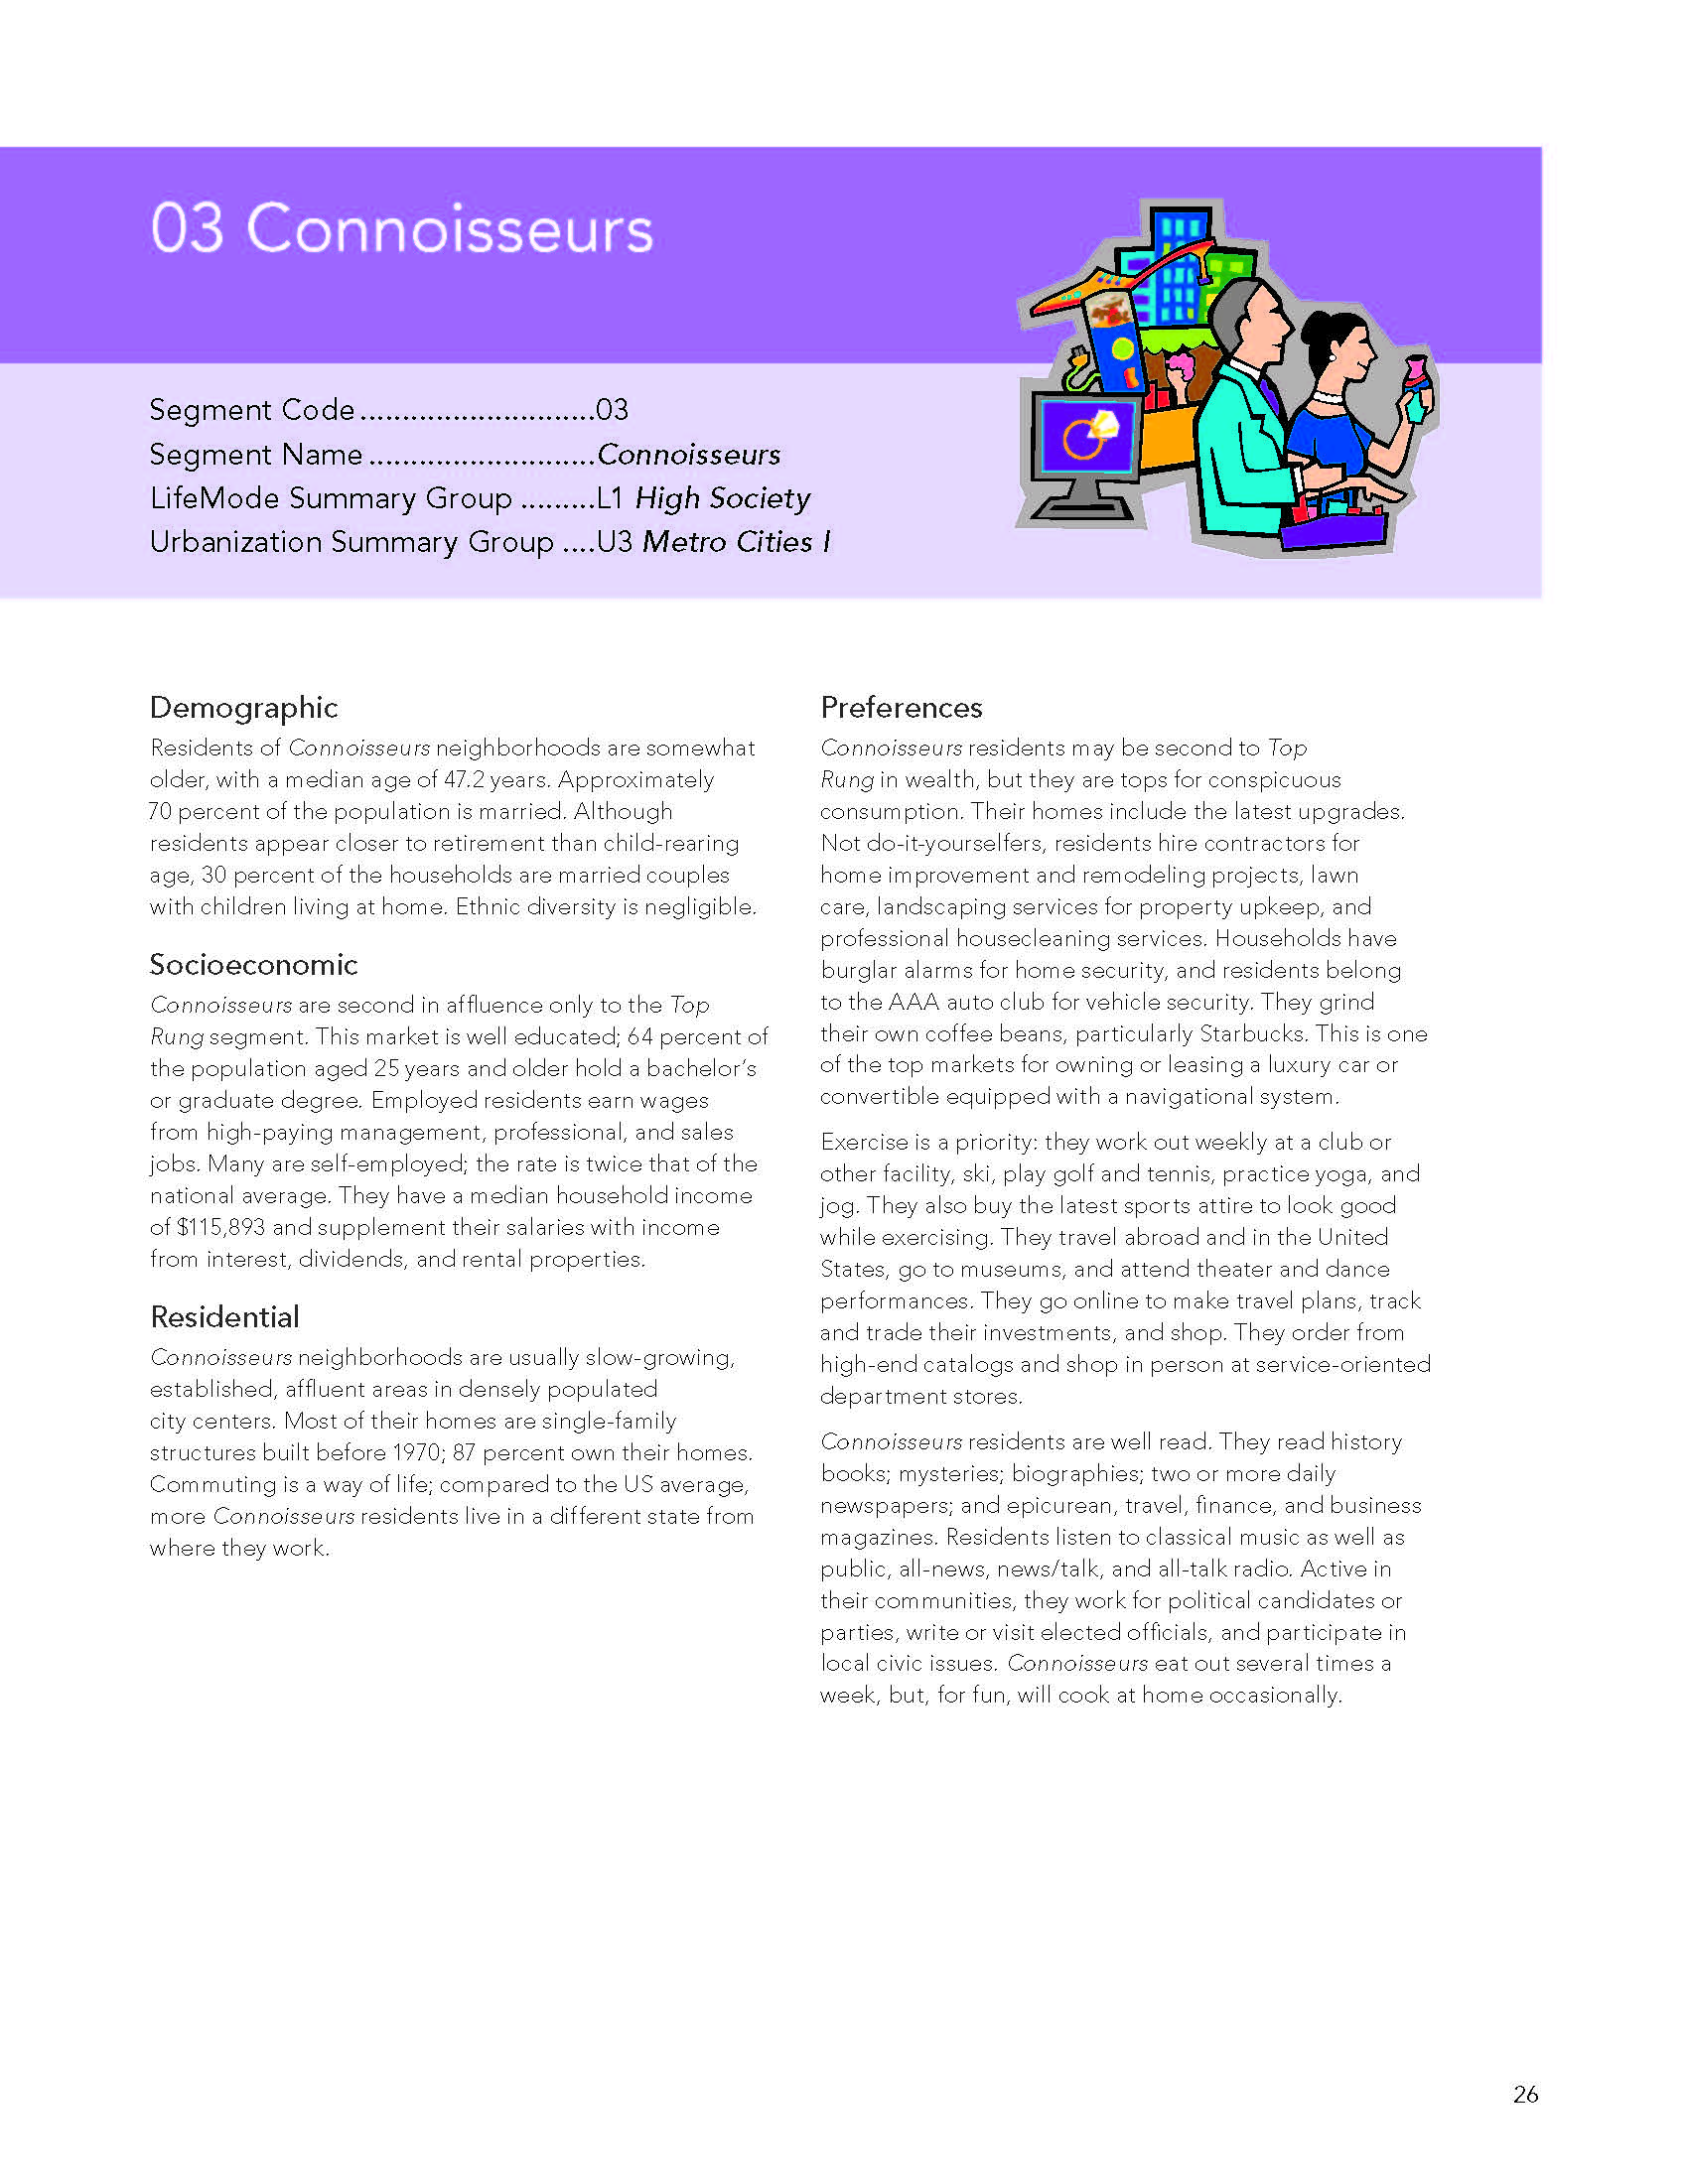 tapestry-segmentation_Page_29.jpg